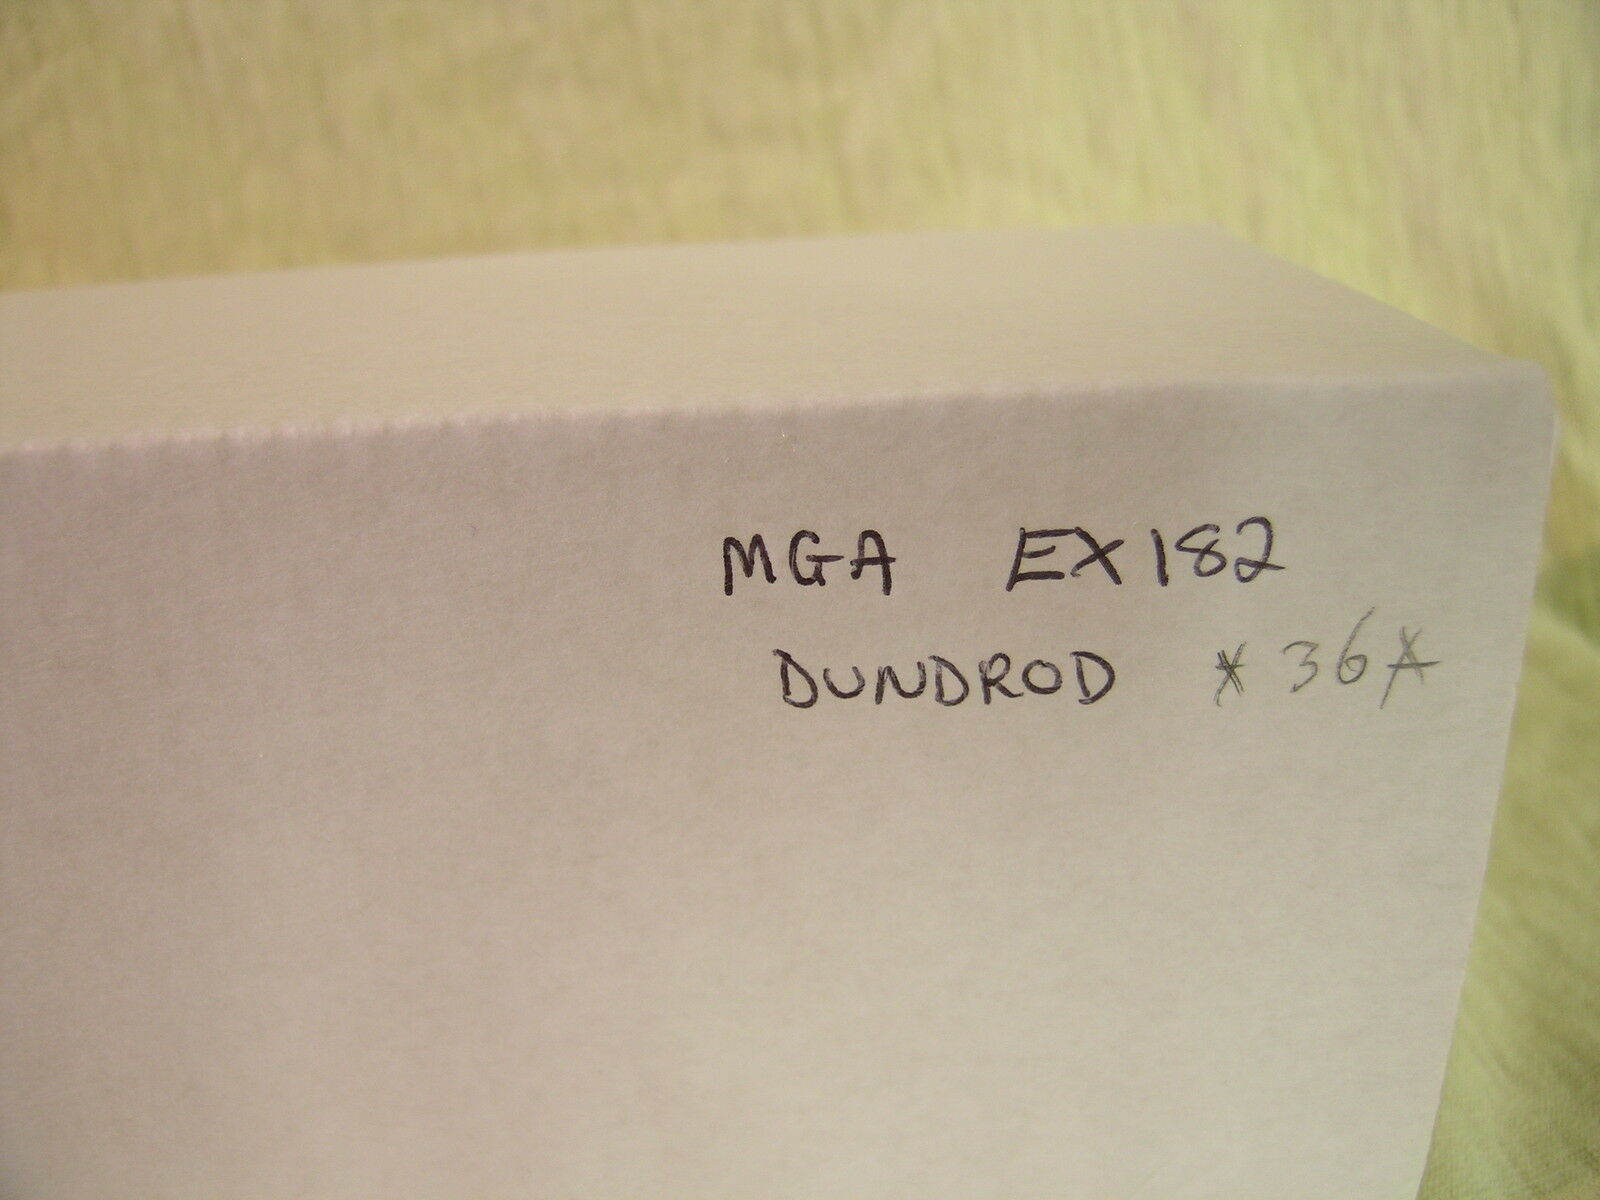 K&R UK MG A EX182 DUNDROD WORKSTEAM 36 BRG WHITEMETAL WHITEMETAL WHITEMETAL HANDBUILT + BOX 1 43 40a5aa